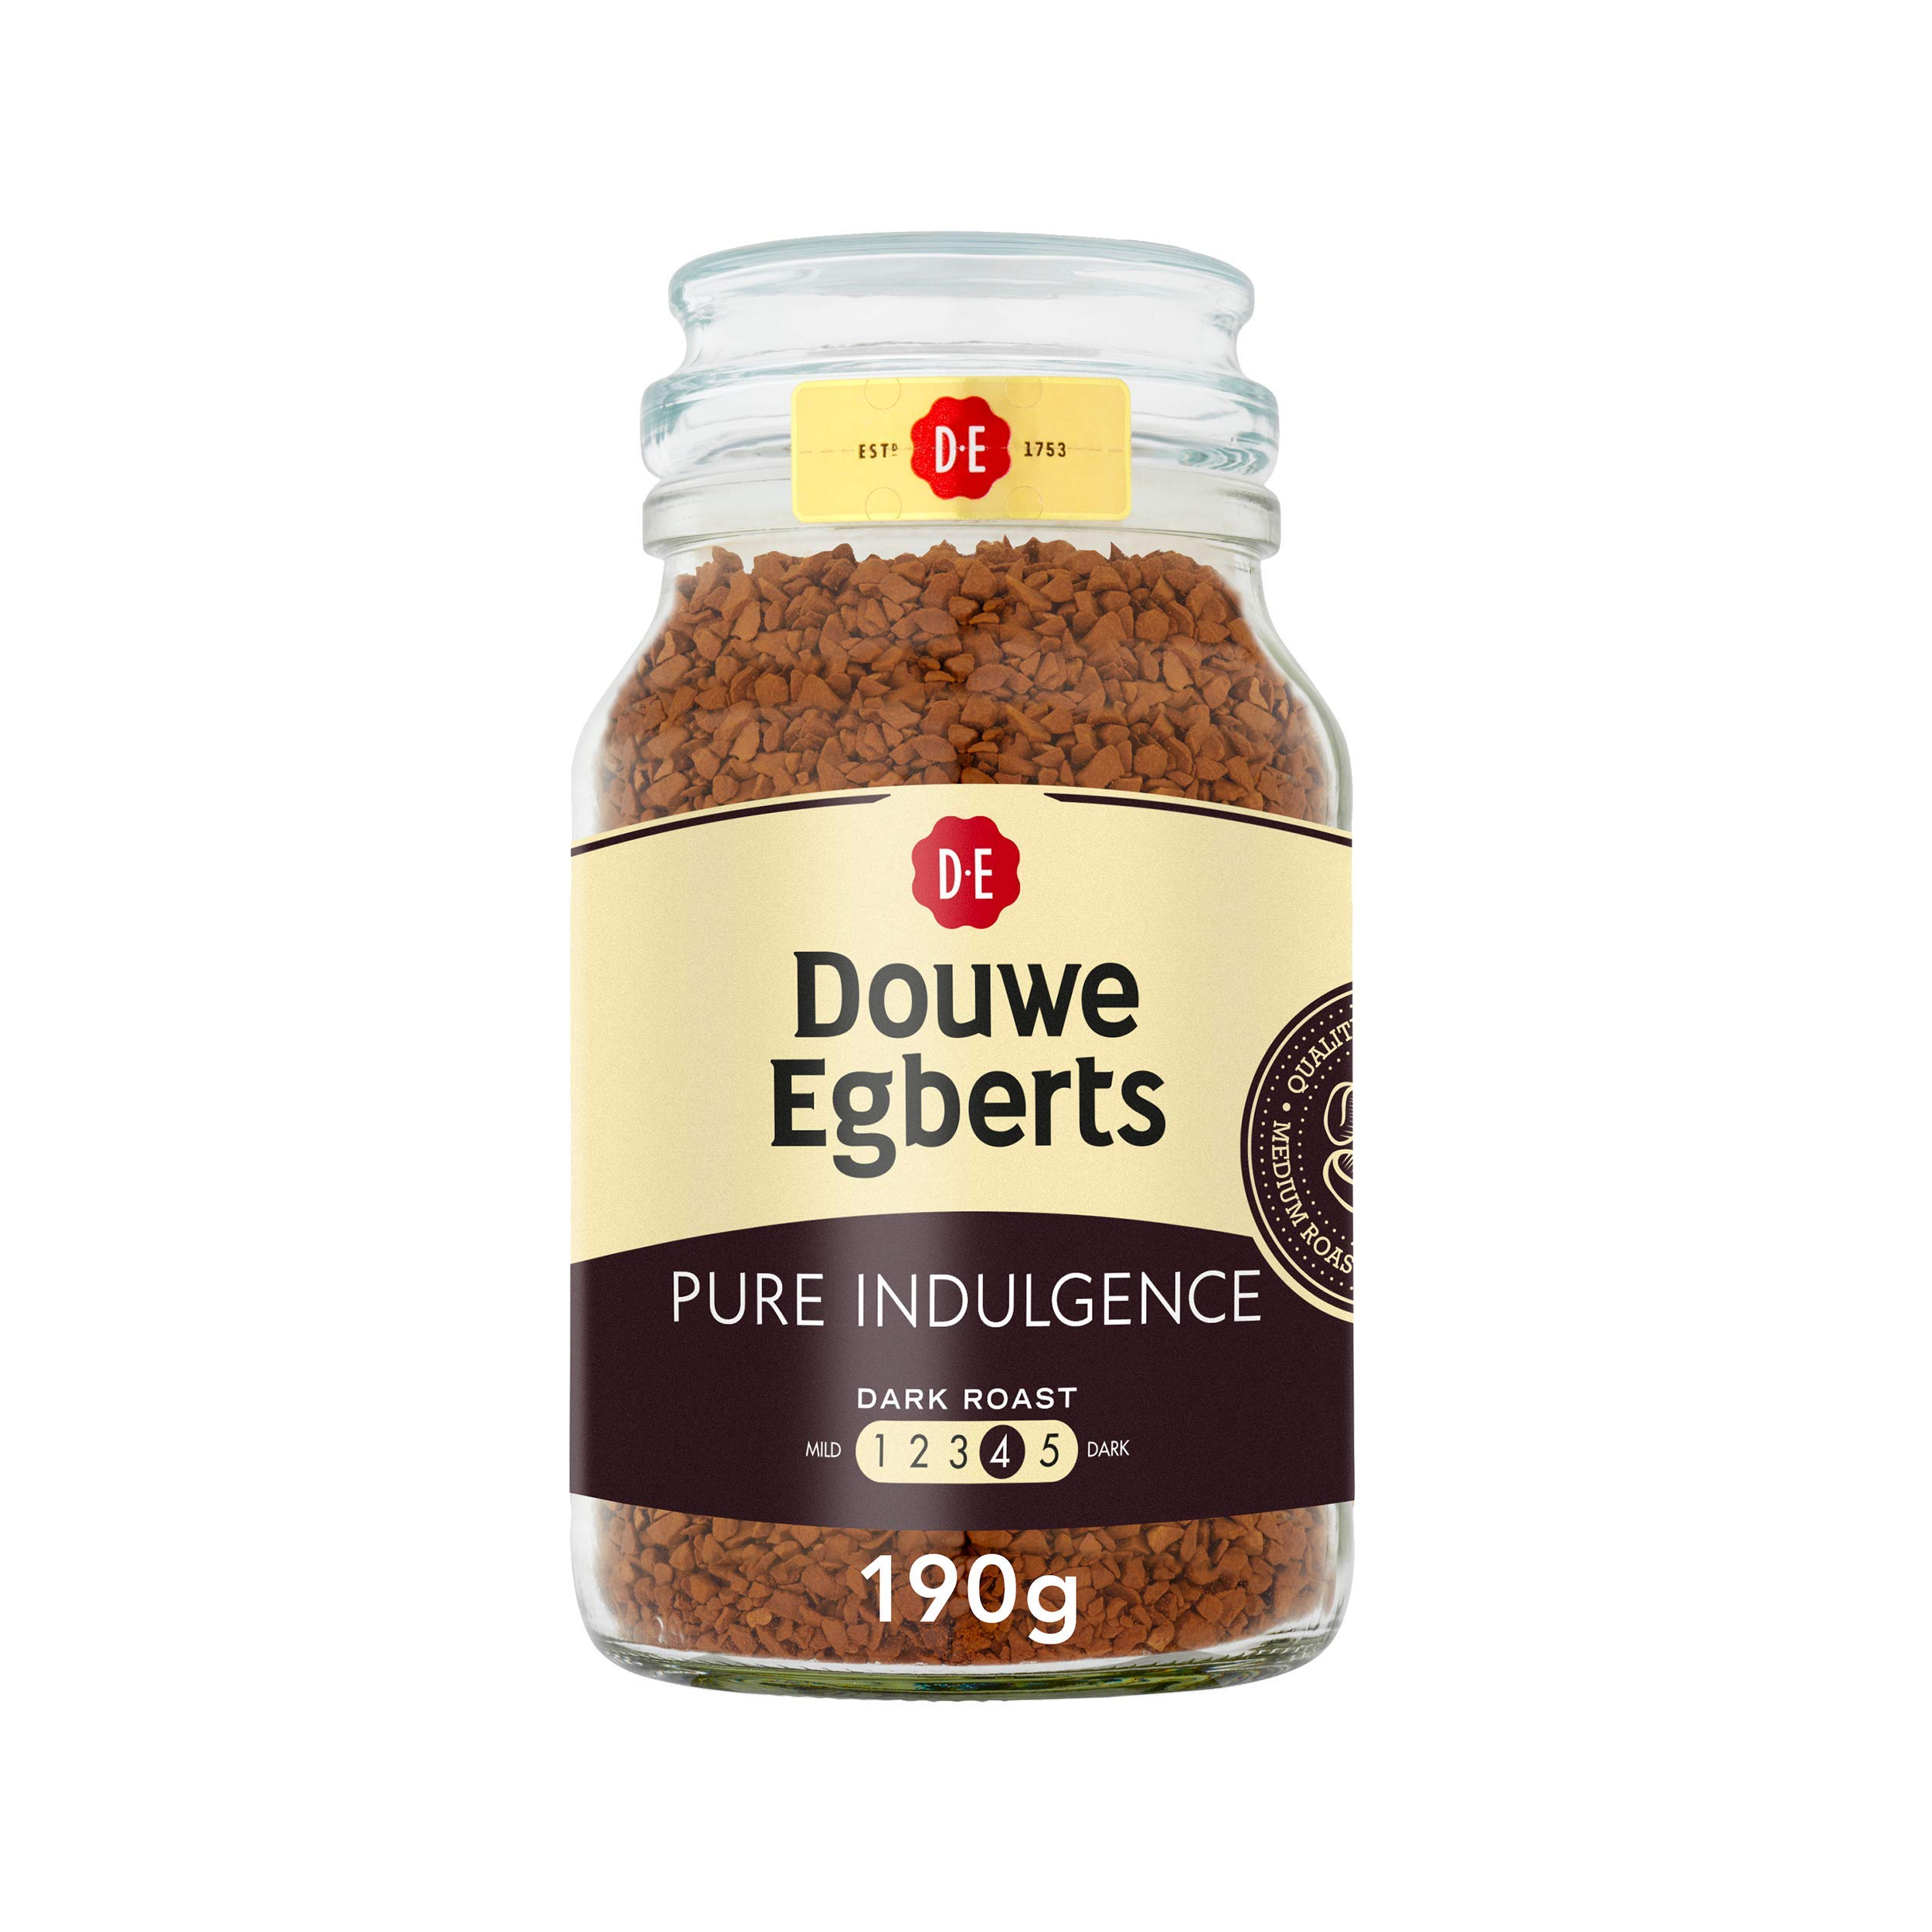 Douwe Egberts Pure Indulgence Instant Coffee in Jar, Dark Roast, 7.05-Ounce, 200 gram